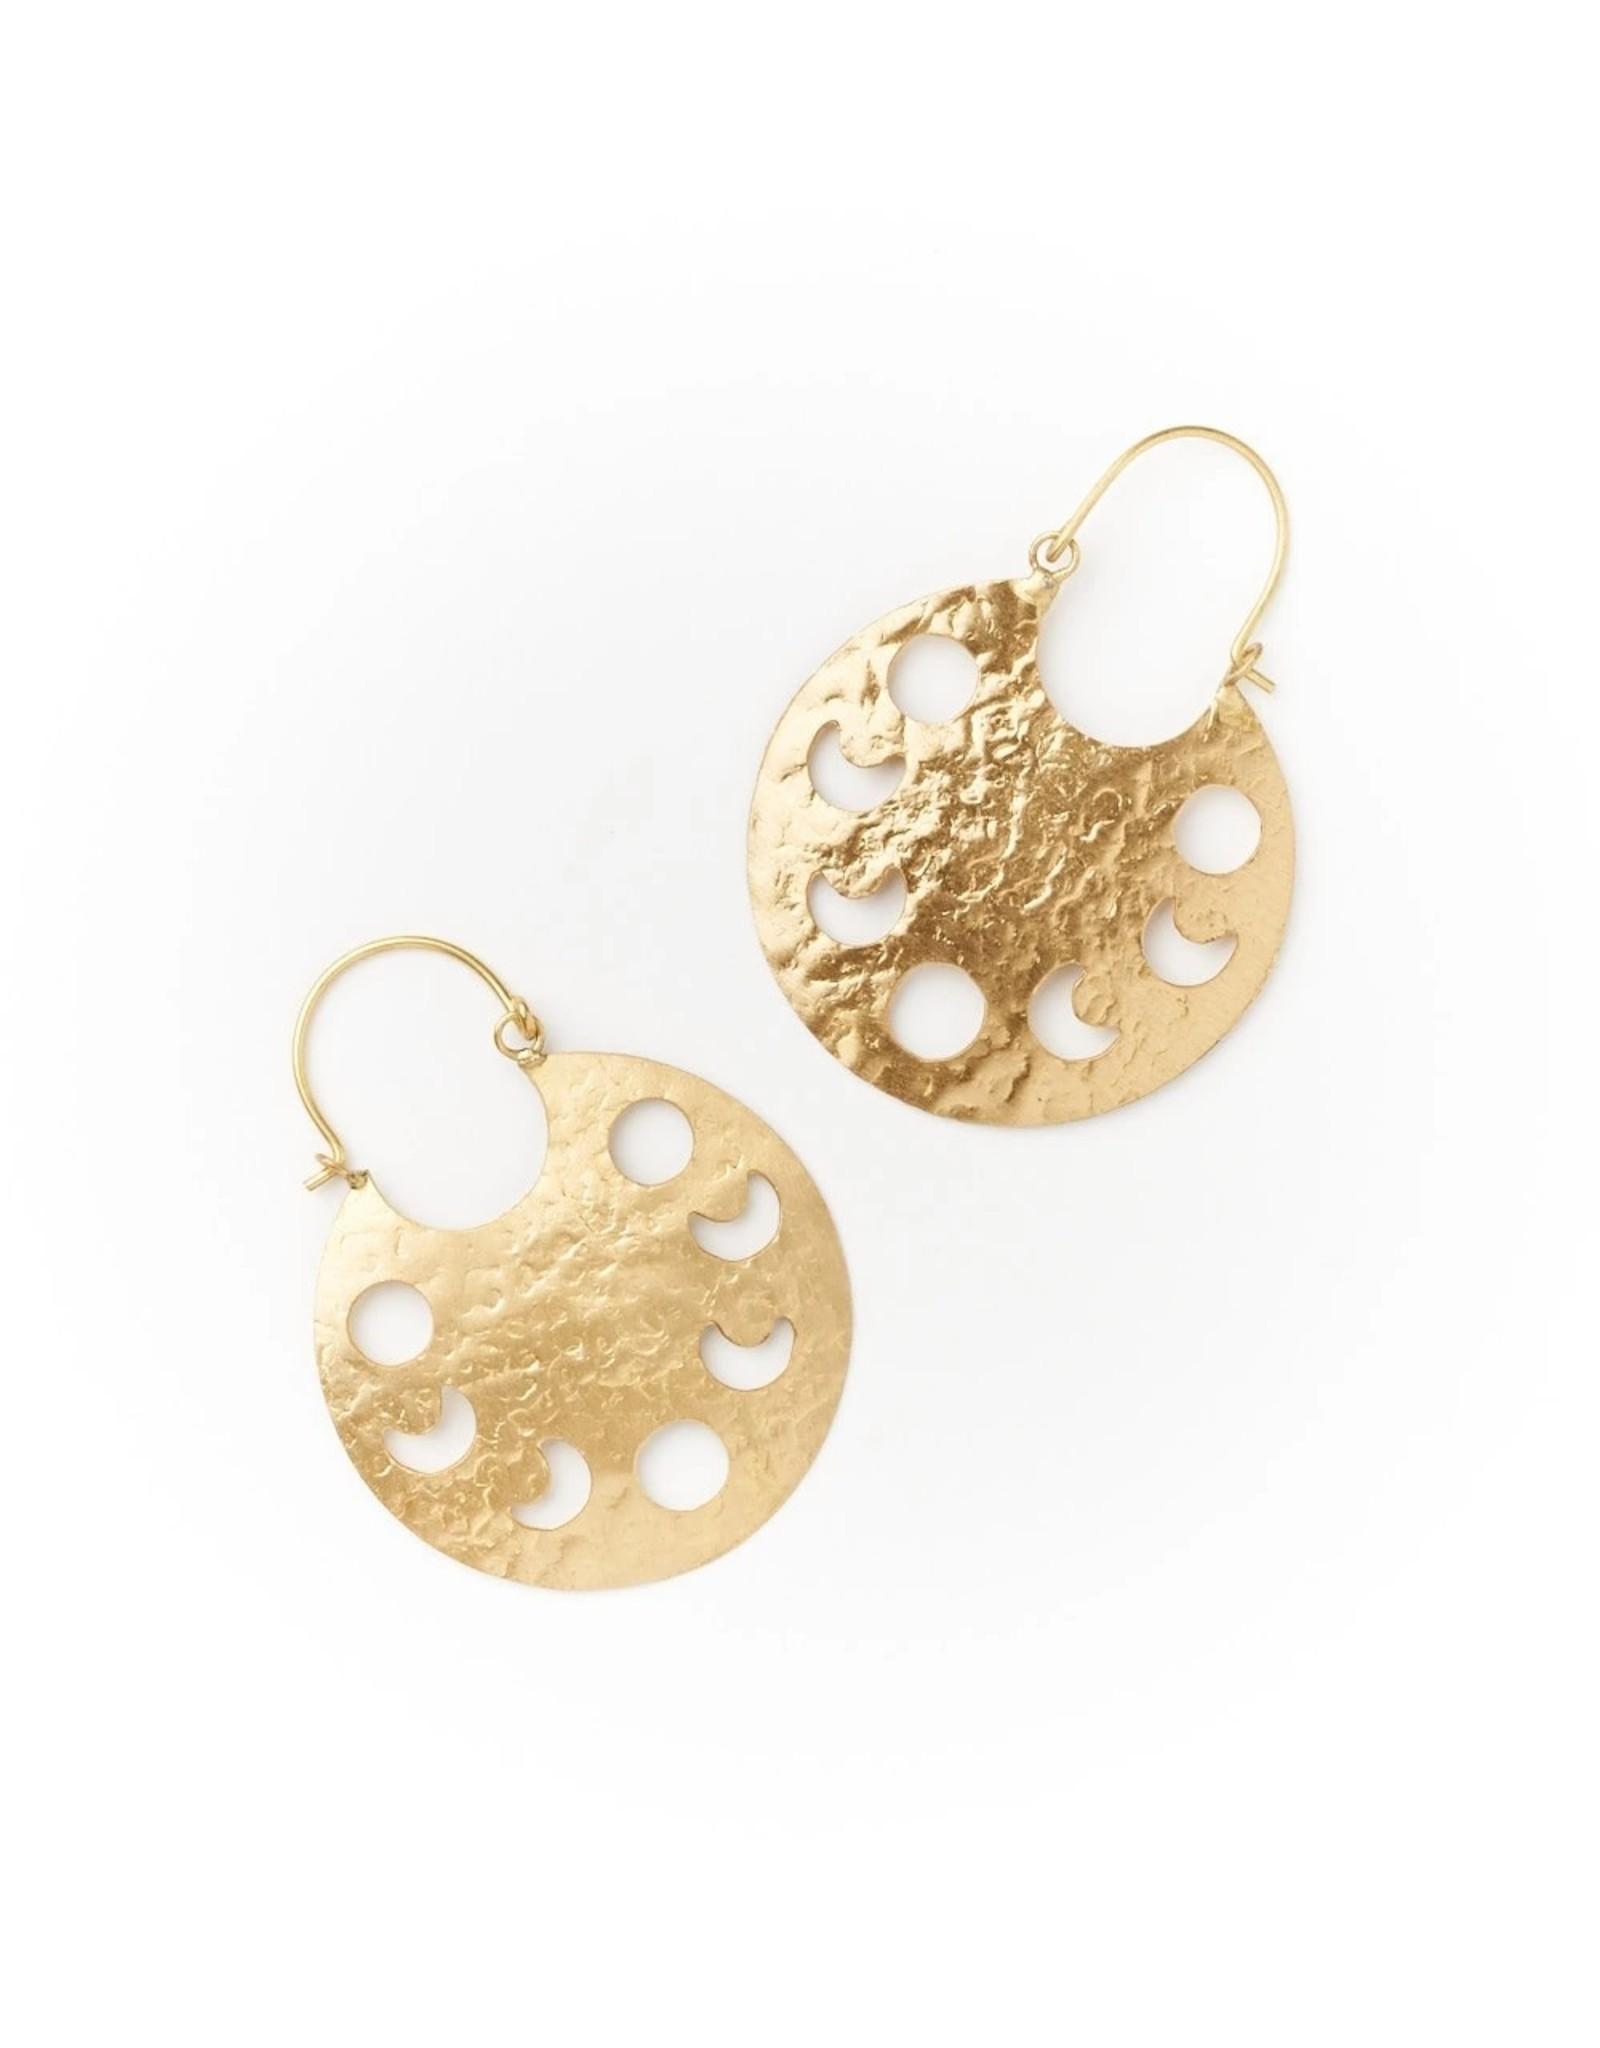 Matr Boomie Rajani earrings- Indu Hoop, India